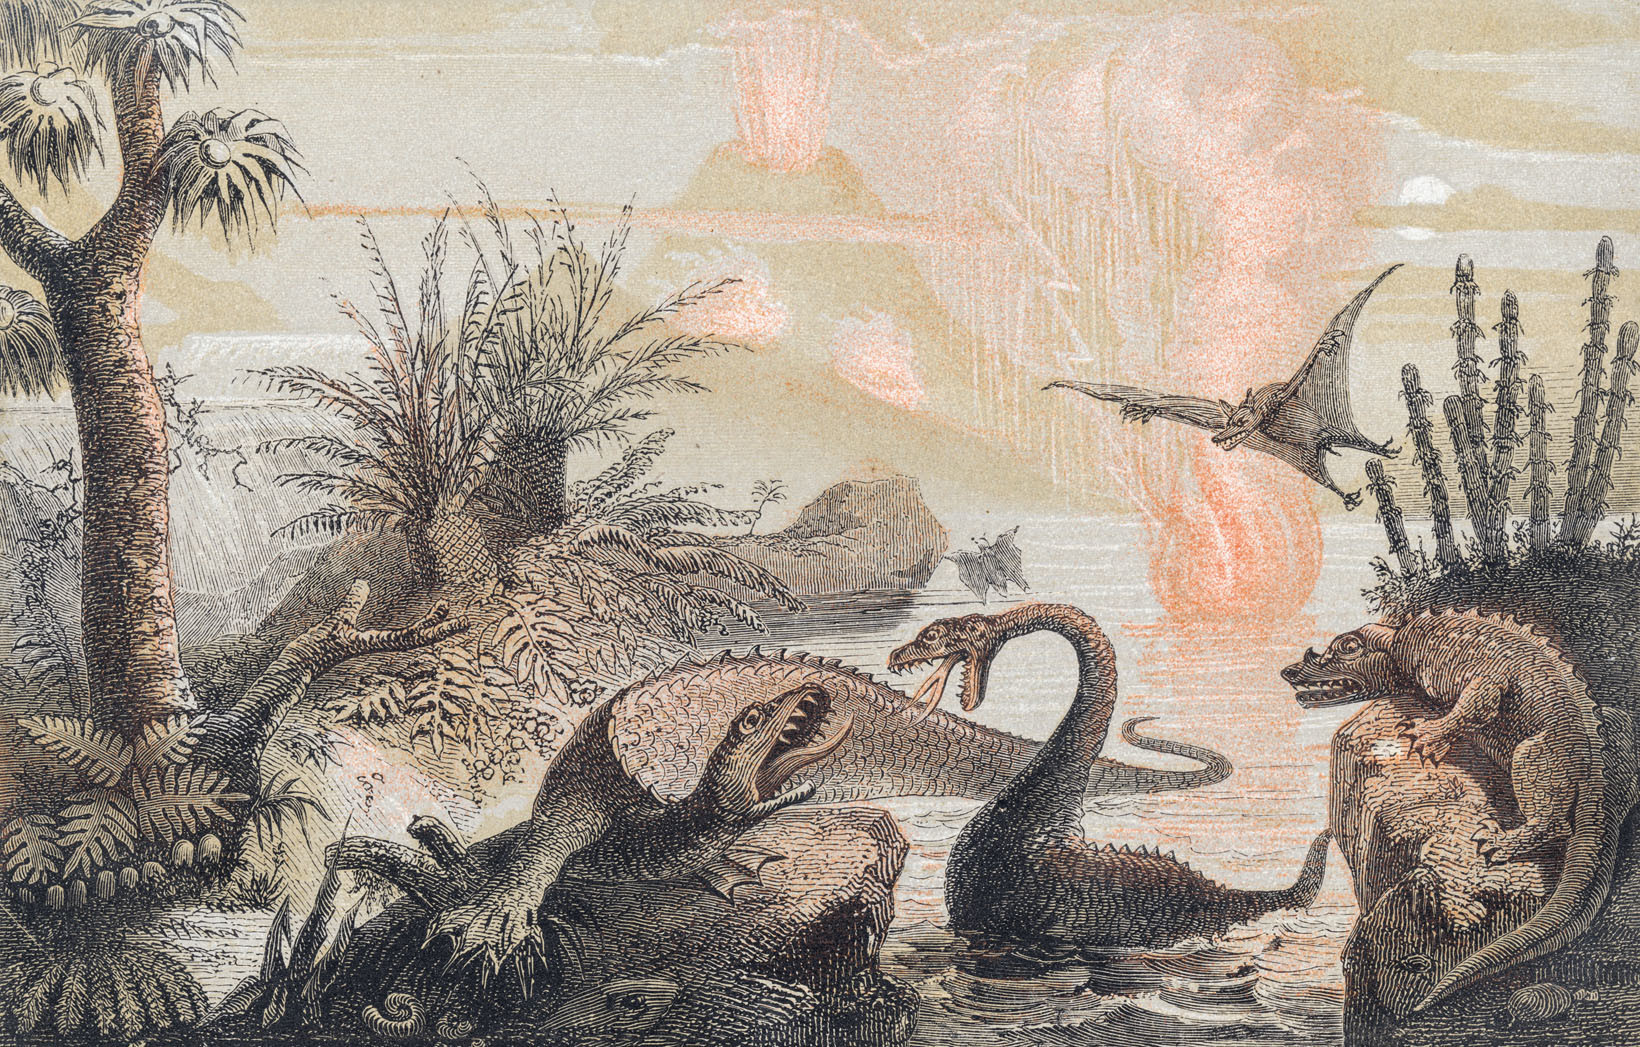 """The Primitive World,"" Adolphe François Pannemaker, 1857."